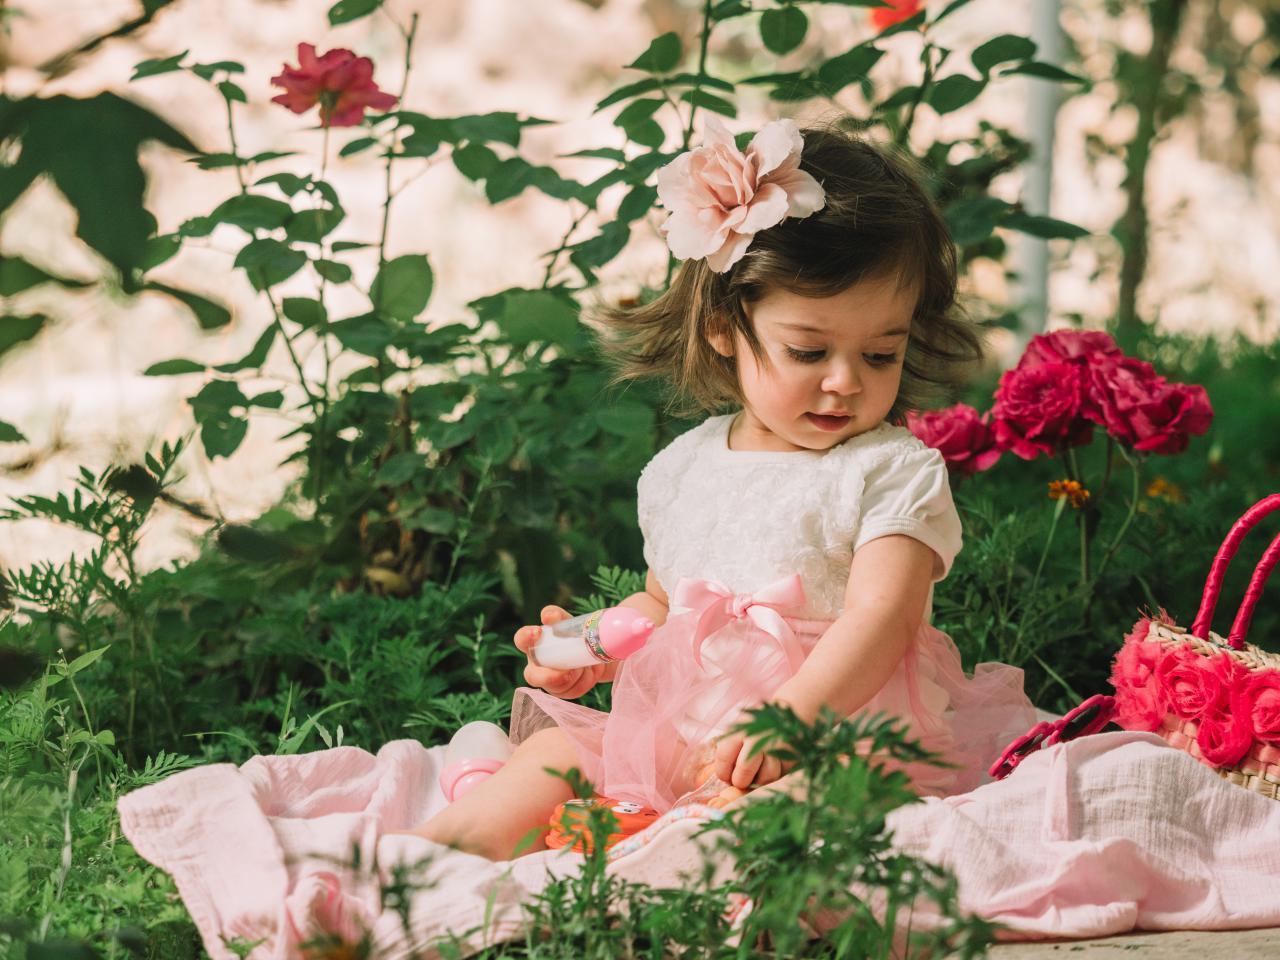 Children-Photography-12.jpg